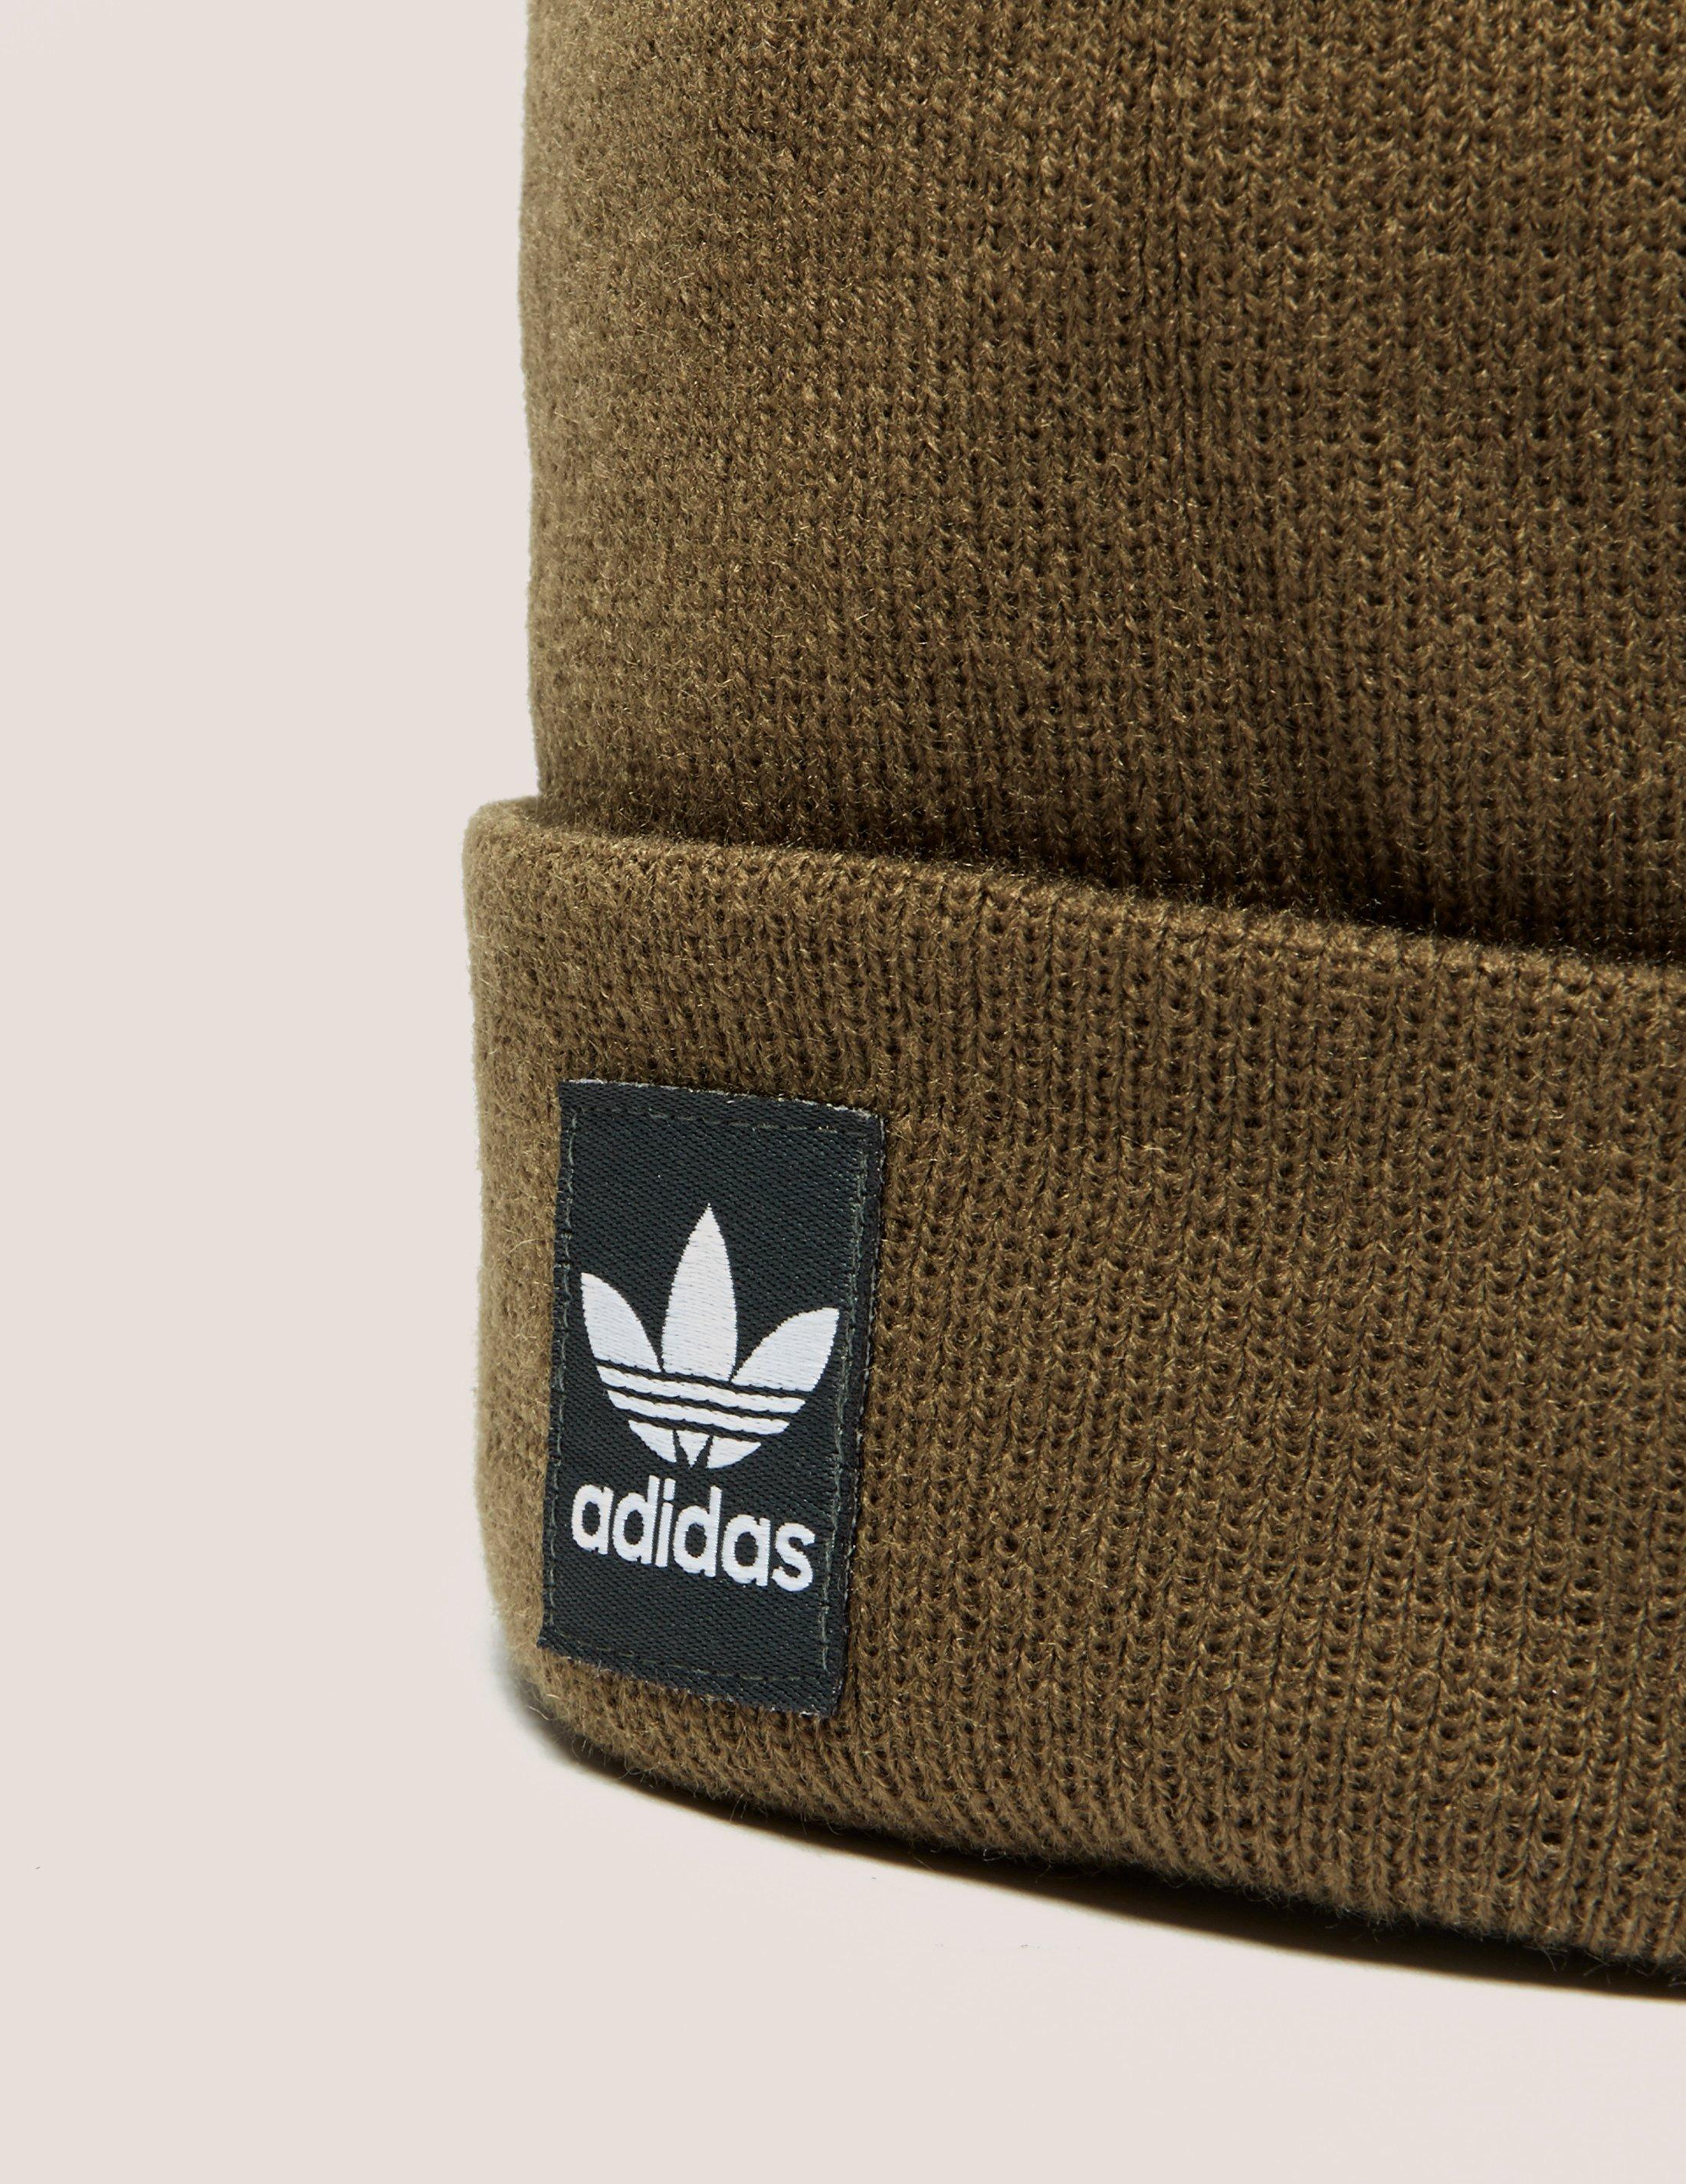 4d74f48f15c adidas Originals Mens Logo Bobble Hat Brown in Brown for Men - Lyst